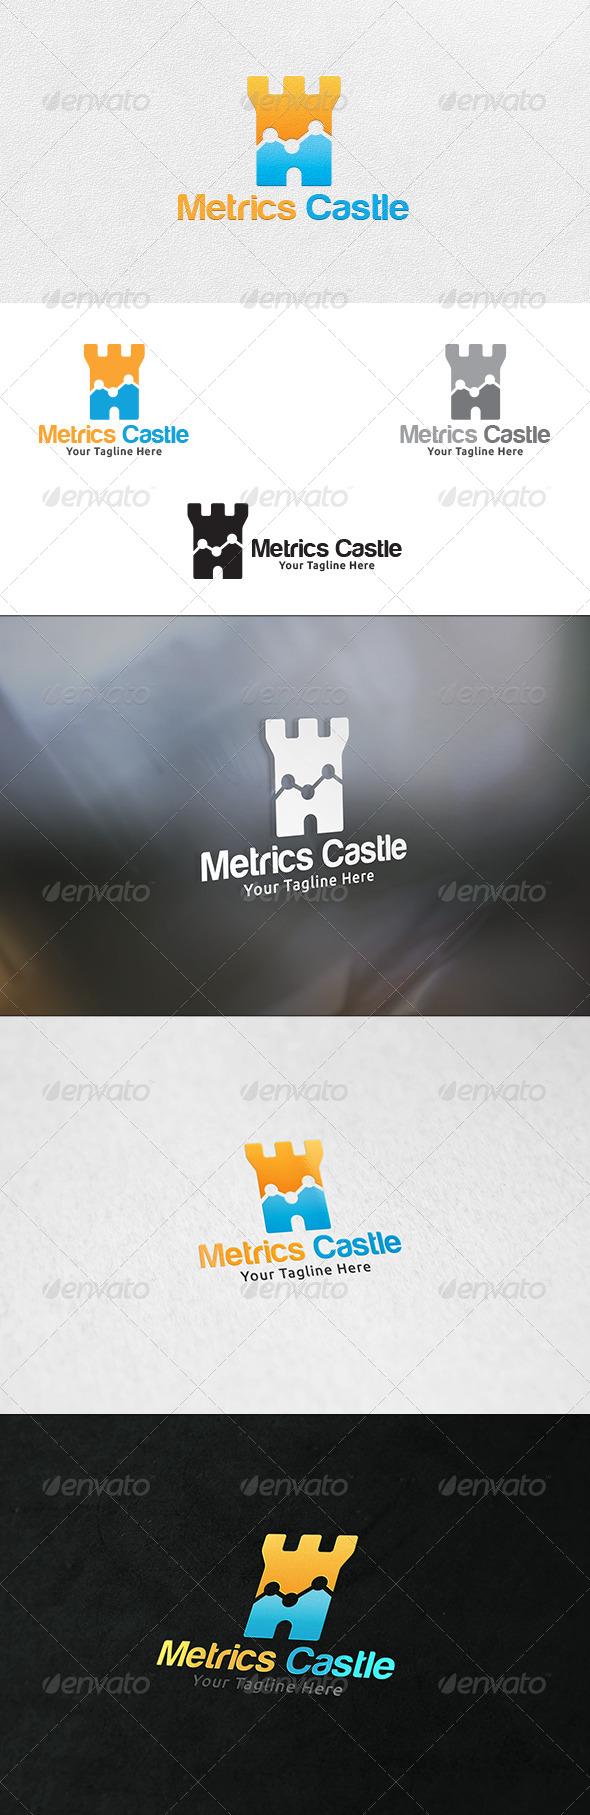 Metrics Castle - Logo Template - Buildings Logo Templates